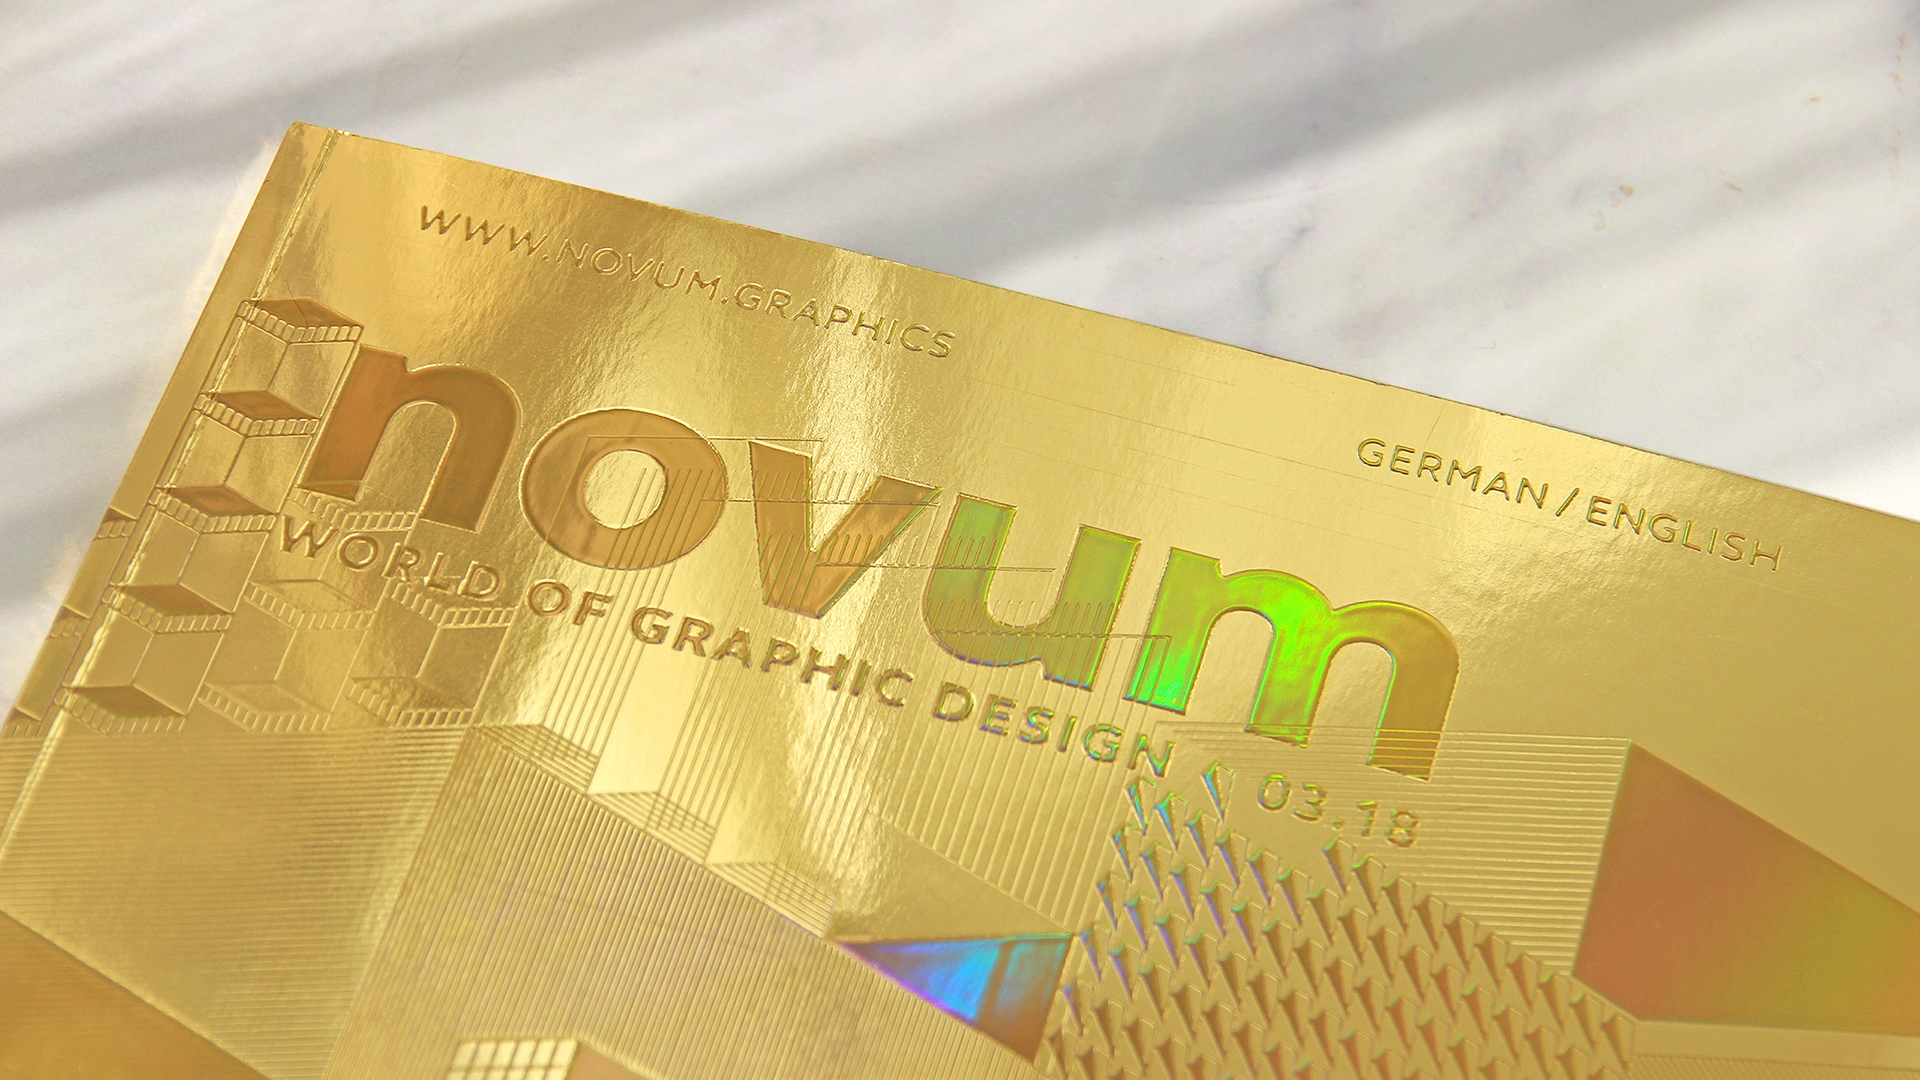 Novum_Cover